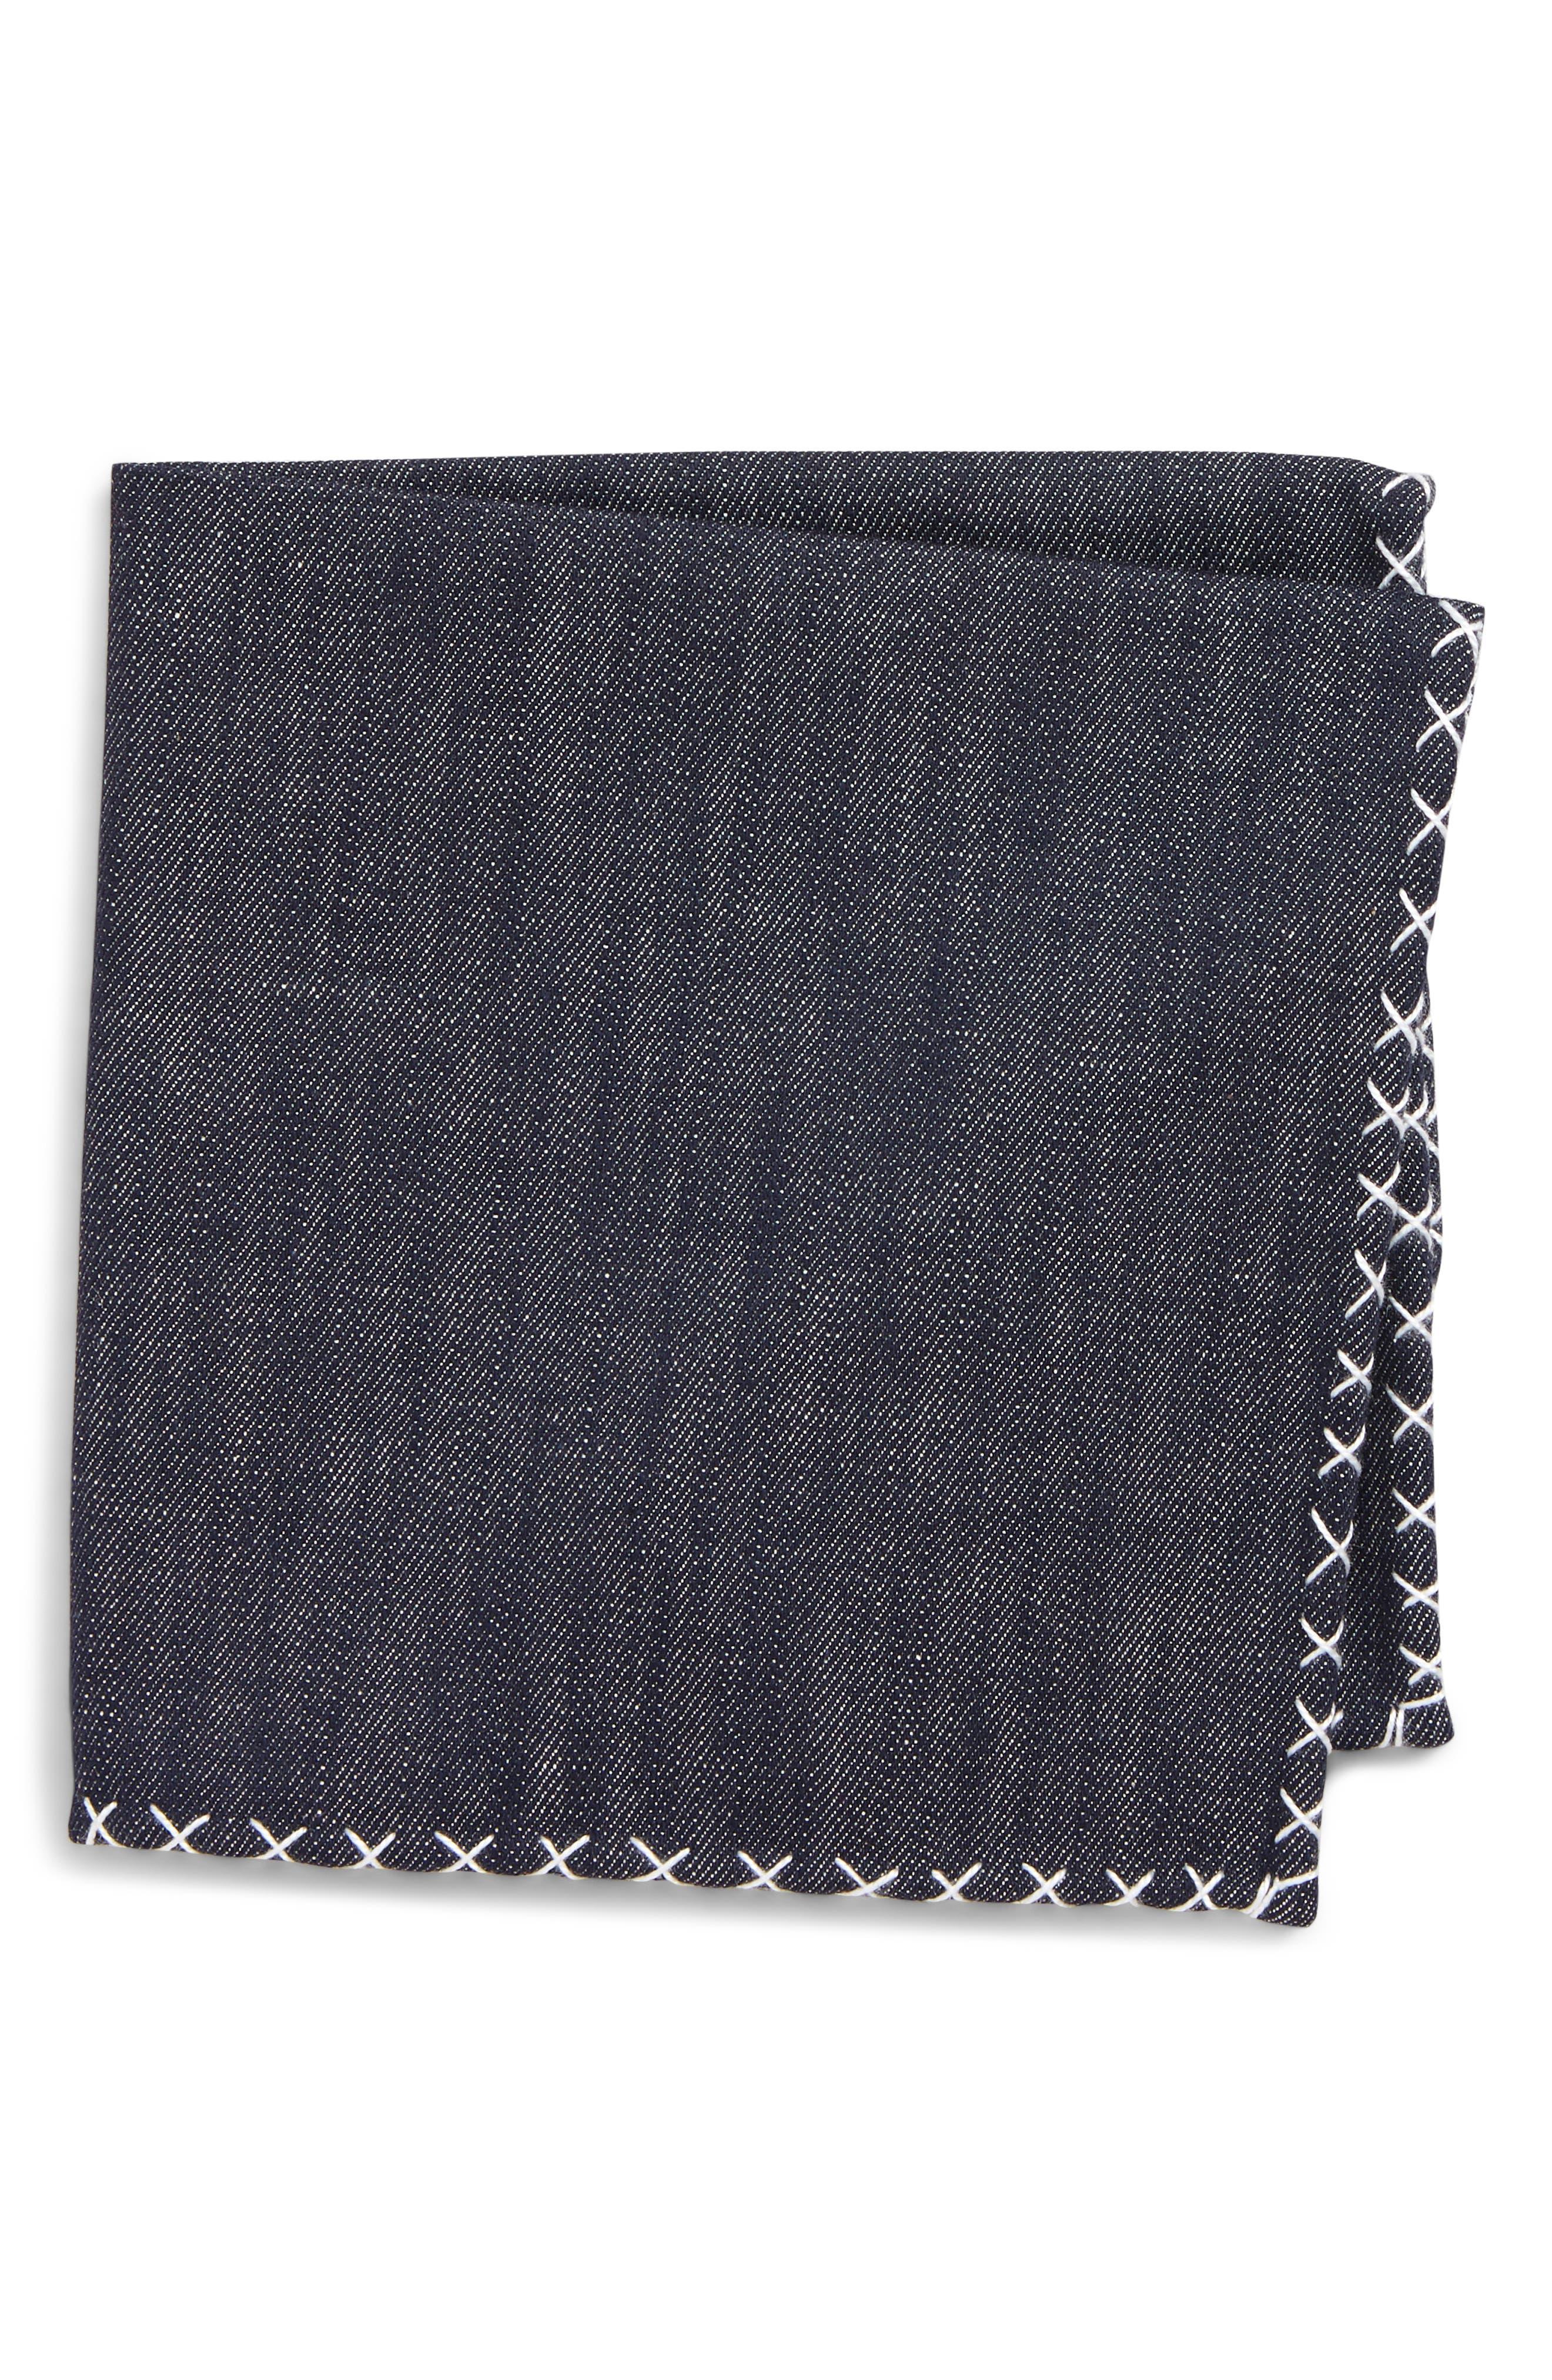 ELEVENTY Denim Cotton Pocket Square, Main, color, DENIM/ WHITE